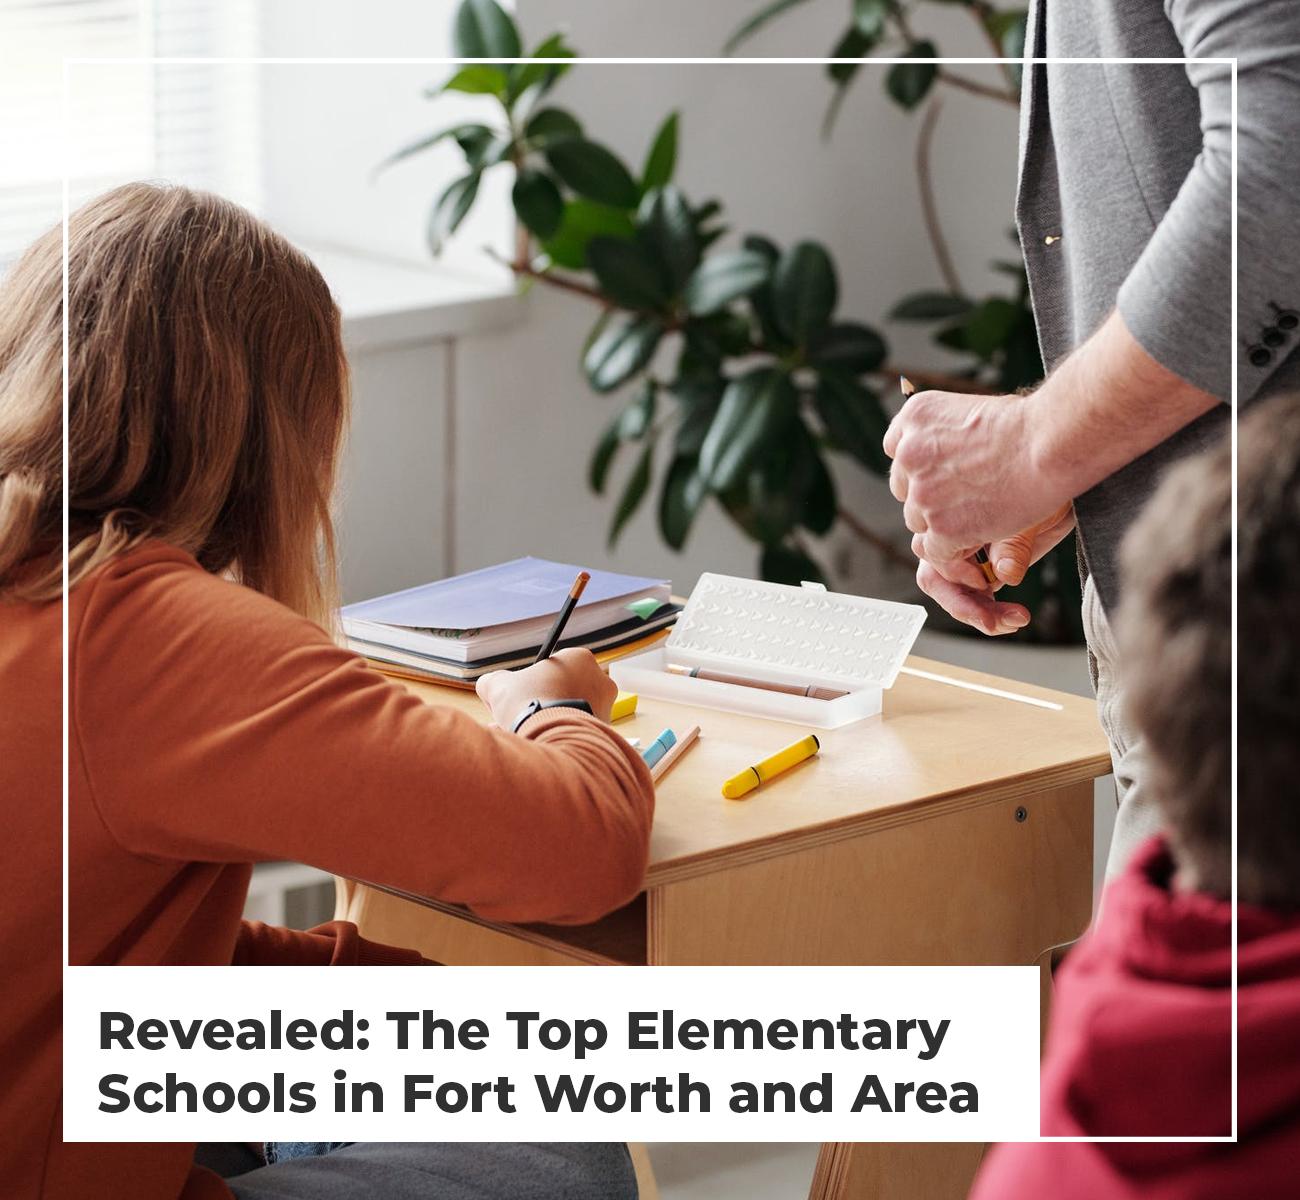 Top Elementary Schools Fort Worth